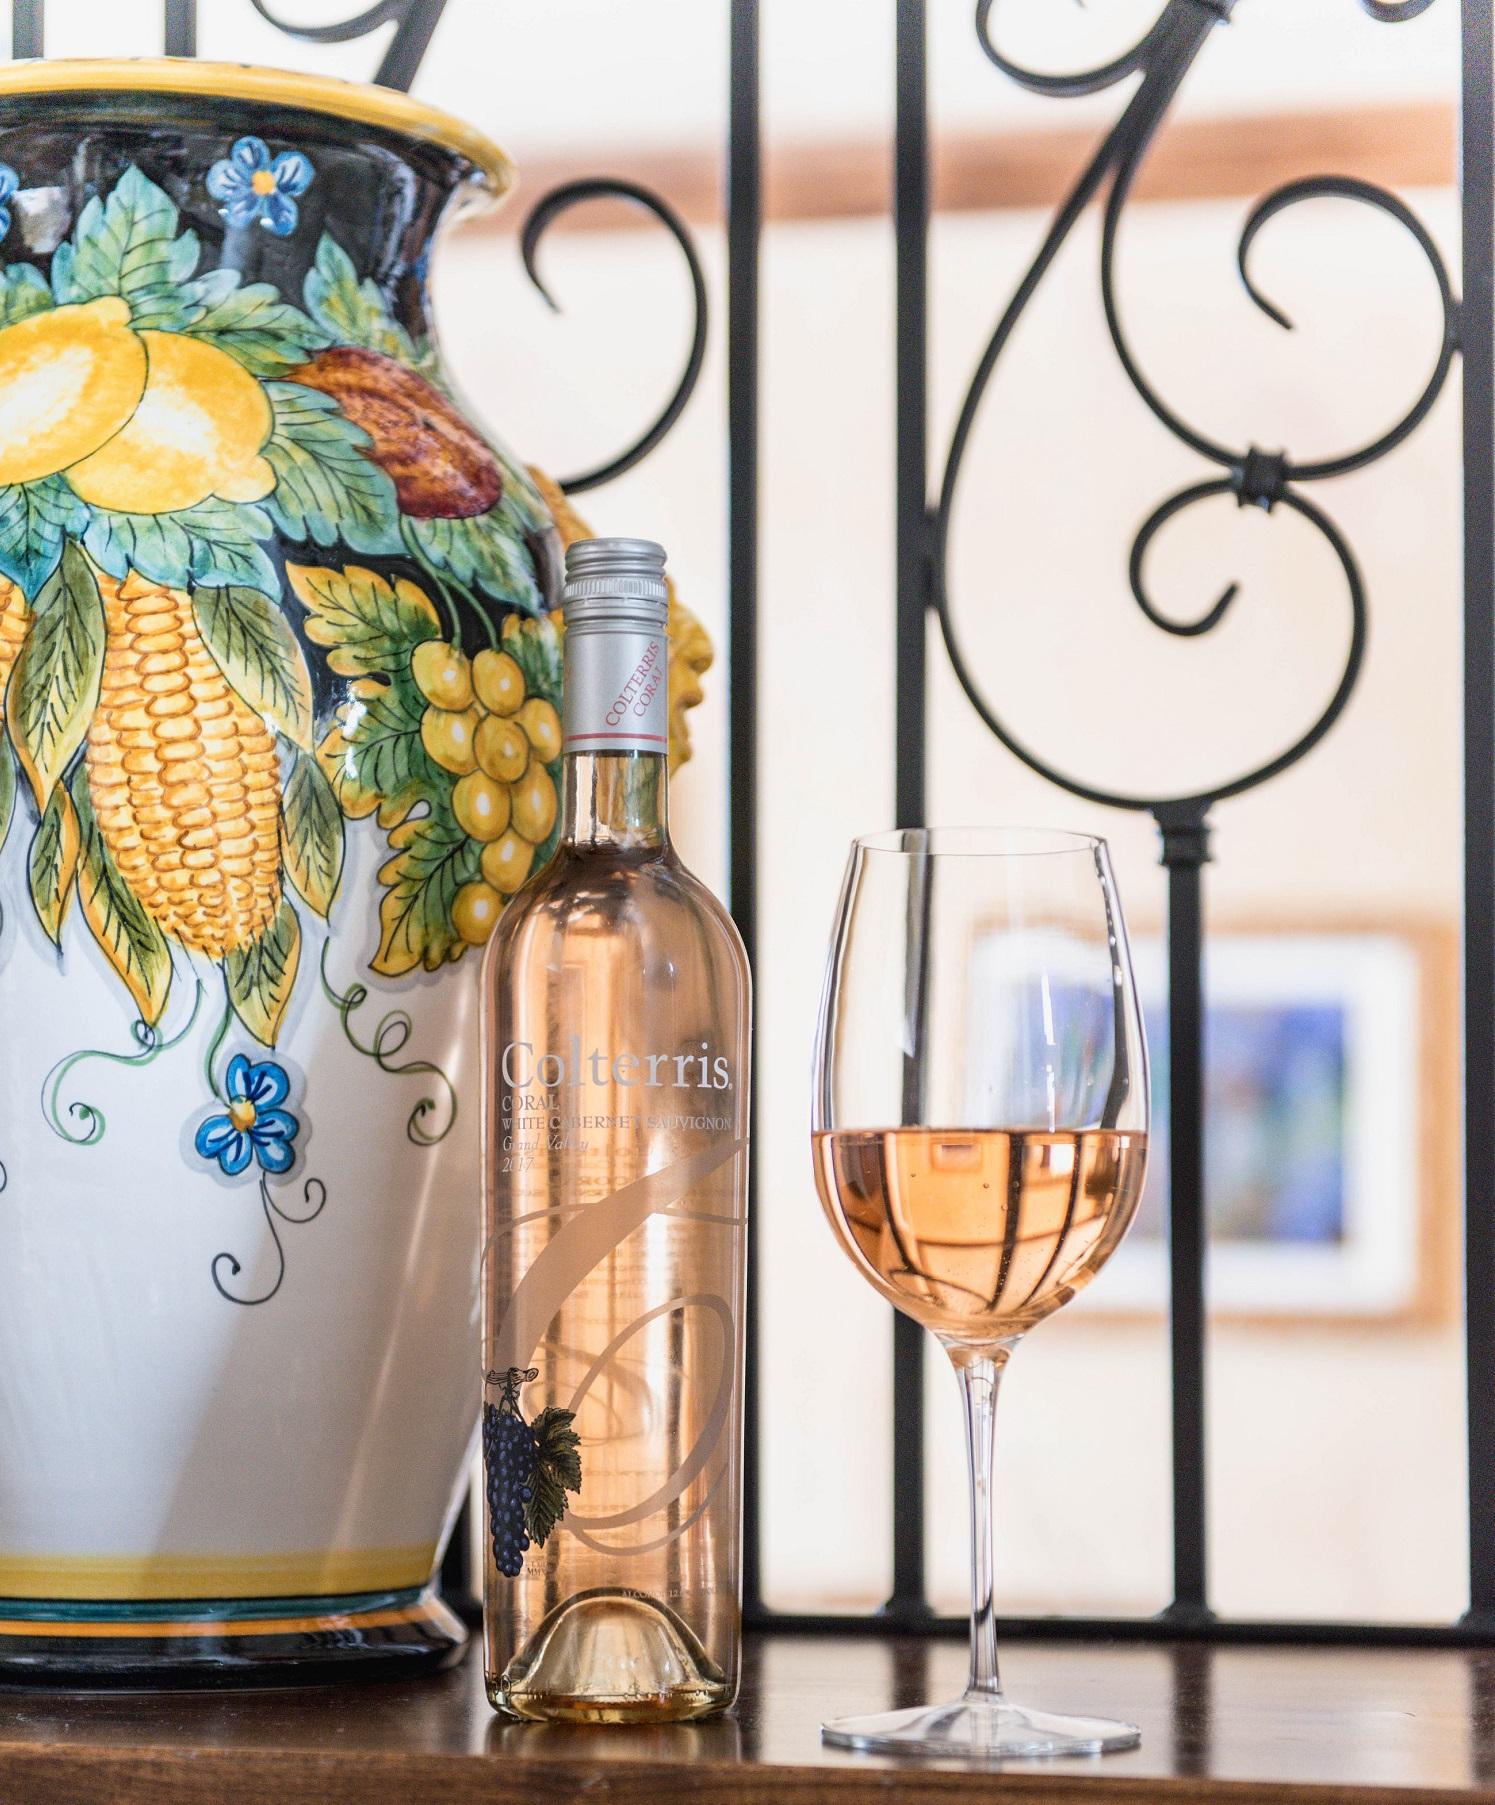 colterris-wine-serving.jpg